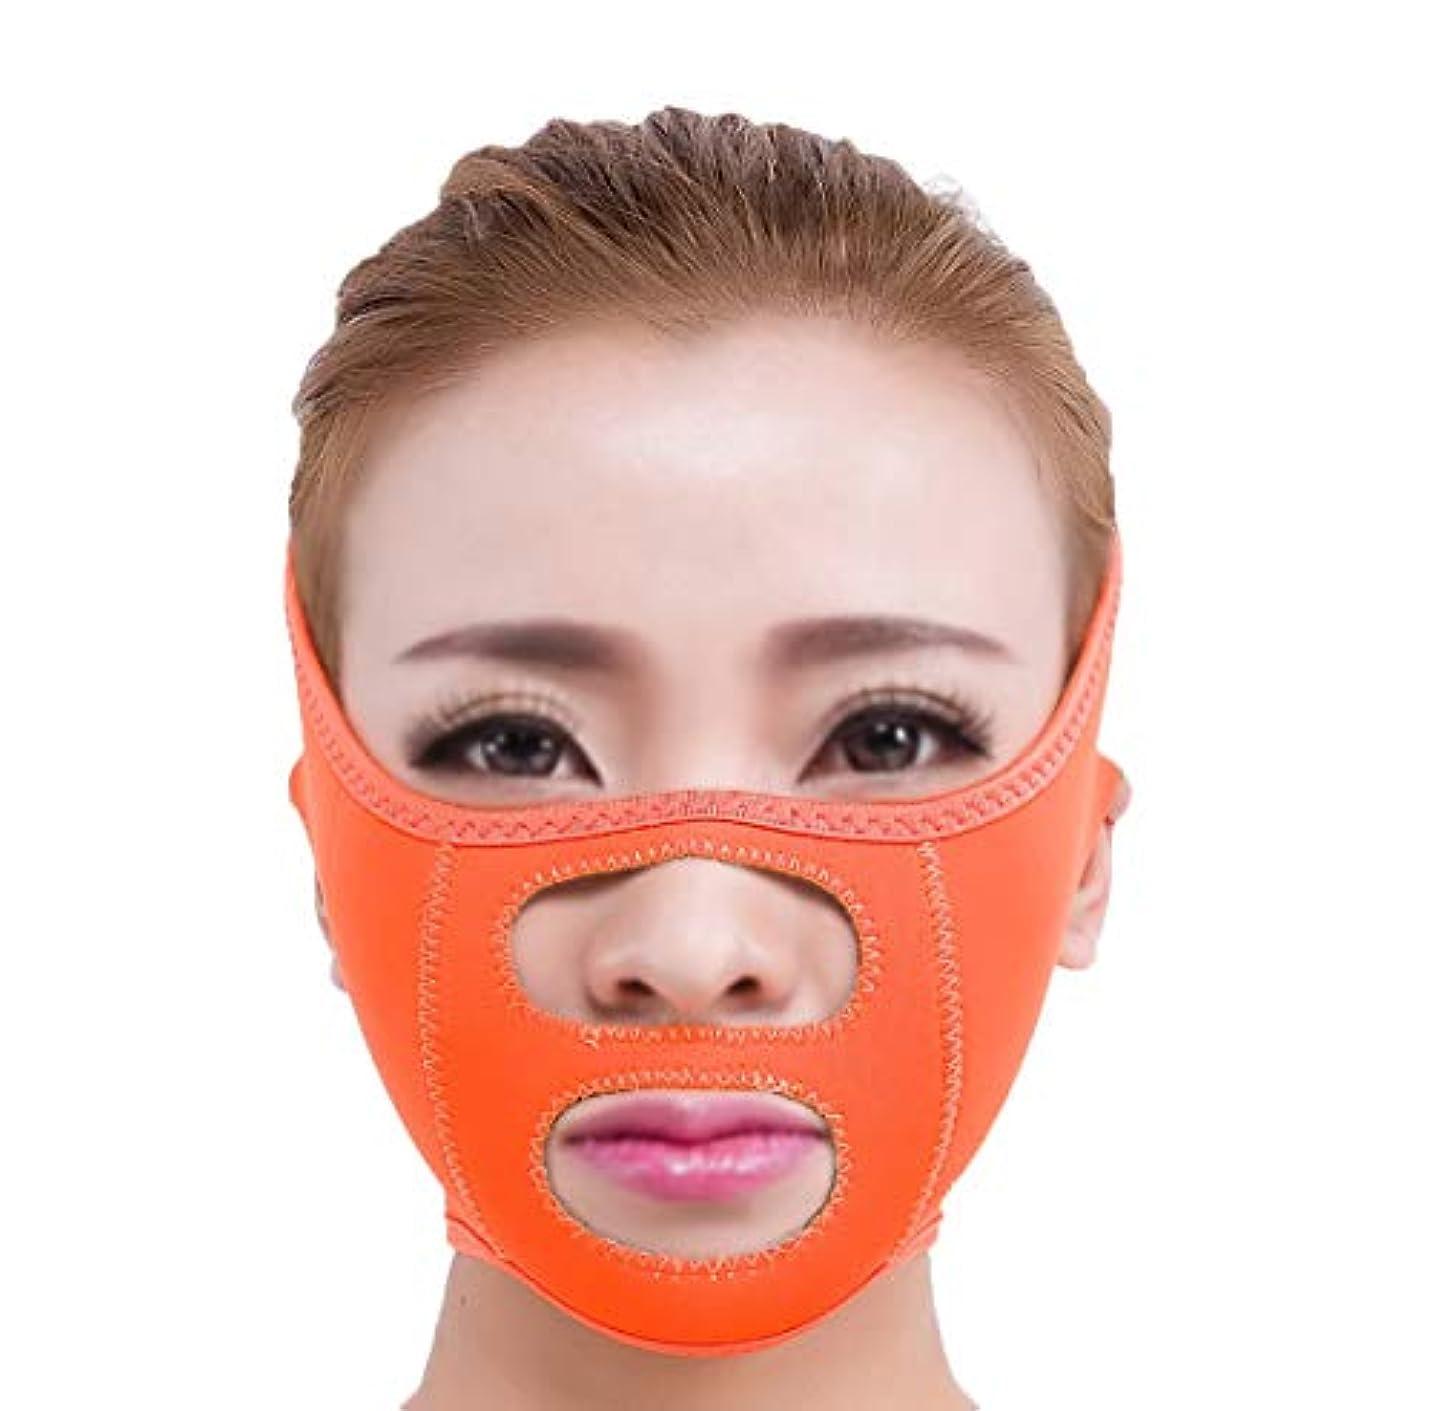 GLJJQMY スリムベルトマスク薄い顔マスク睡眠薄い顔マスク薄い顔包帯薄い顔アーティファクト薄い顔薄い顔薄い顔小さいV顔睡眠薄い顔ベルト 顔用整形マスク (Color : Blue)